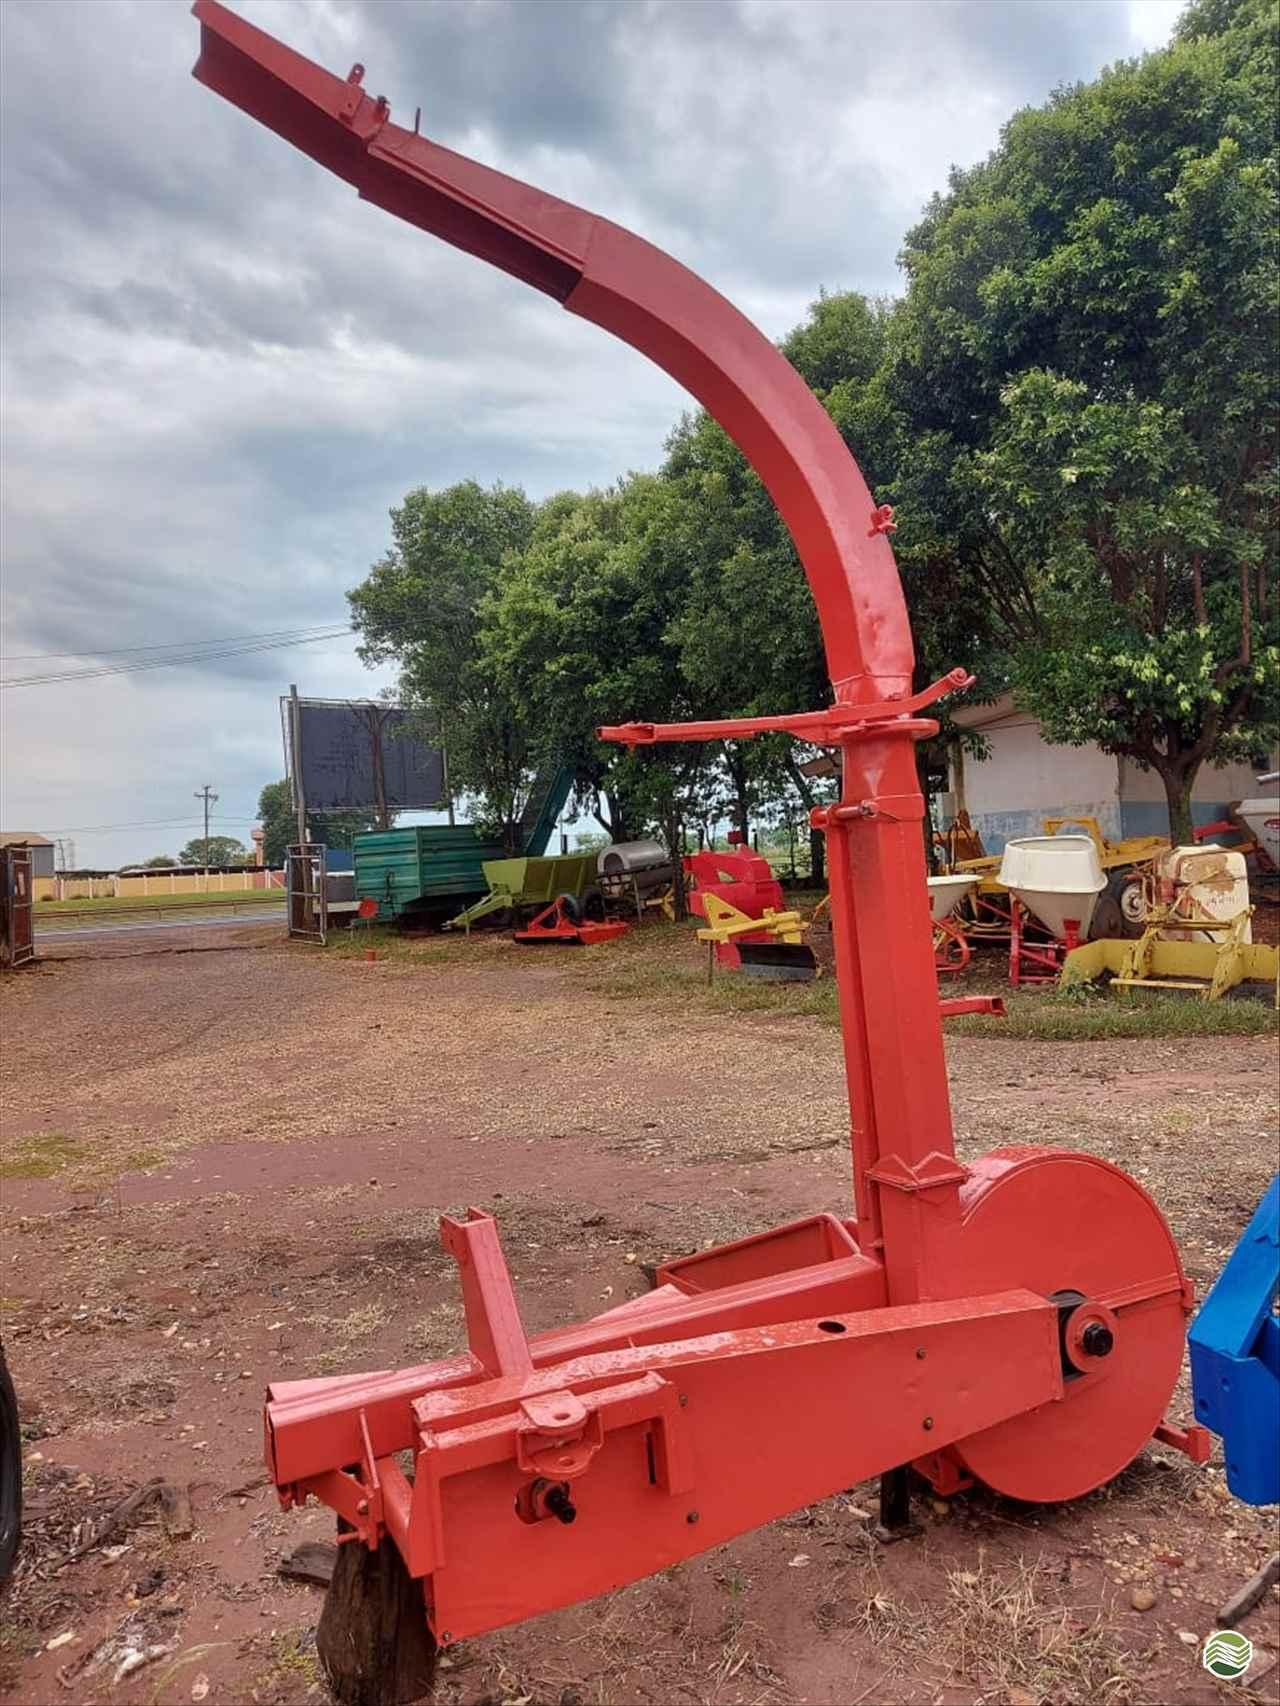 IMPLEMENTOS AGRICOLAS ENSILADEIRA ENSILADEIRA 1 LINHA Terra Santa Implementos Agrícolas BEBEDOURO SÃO PAULO SP